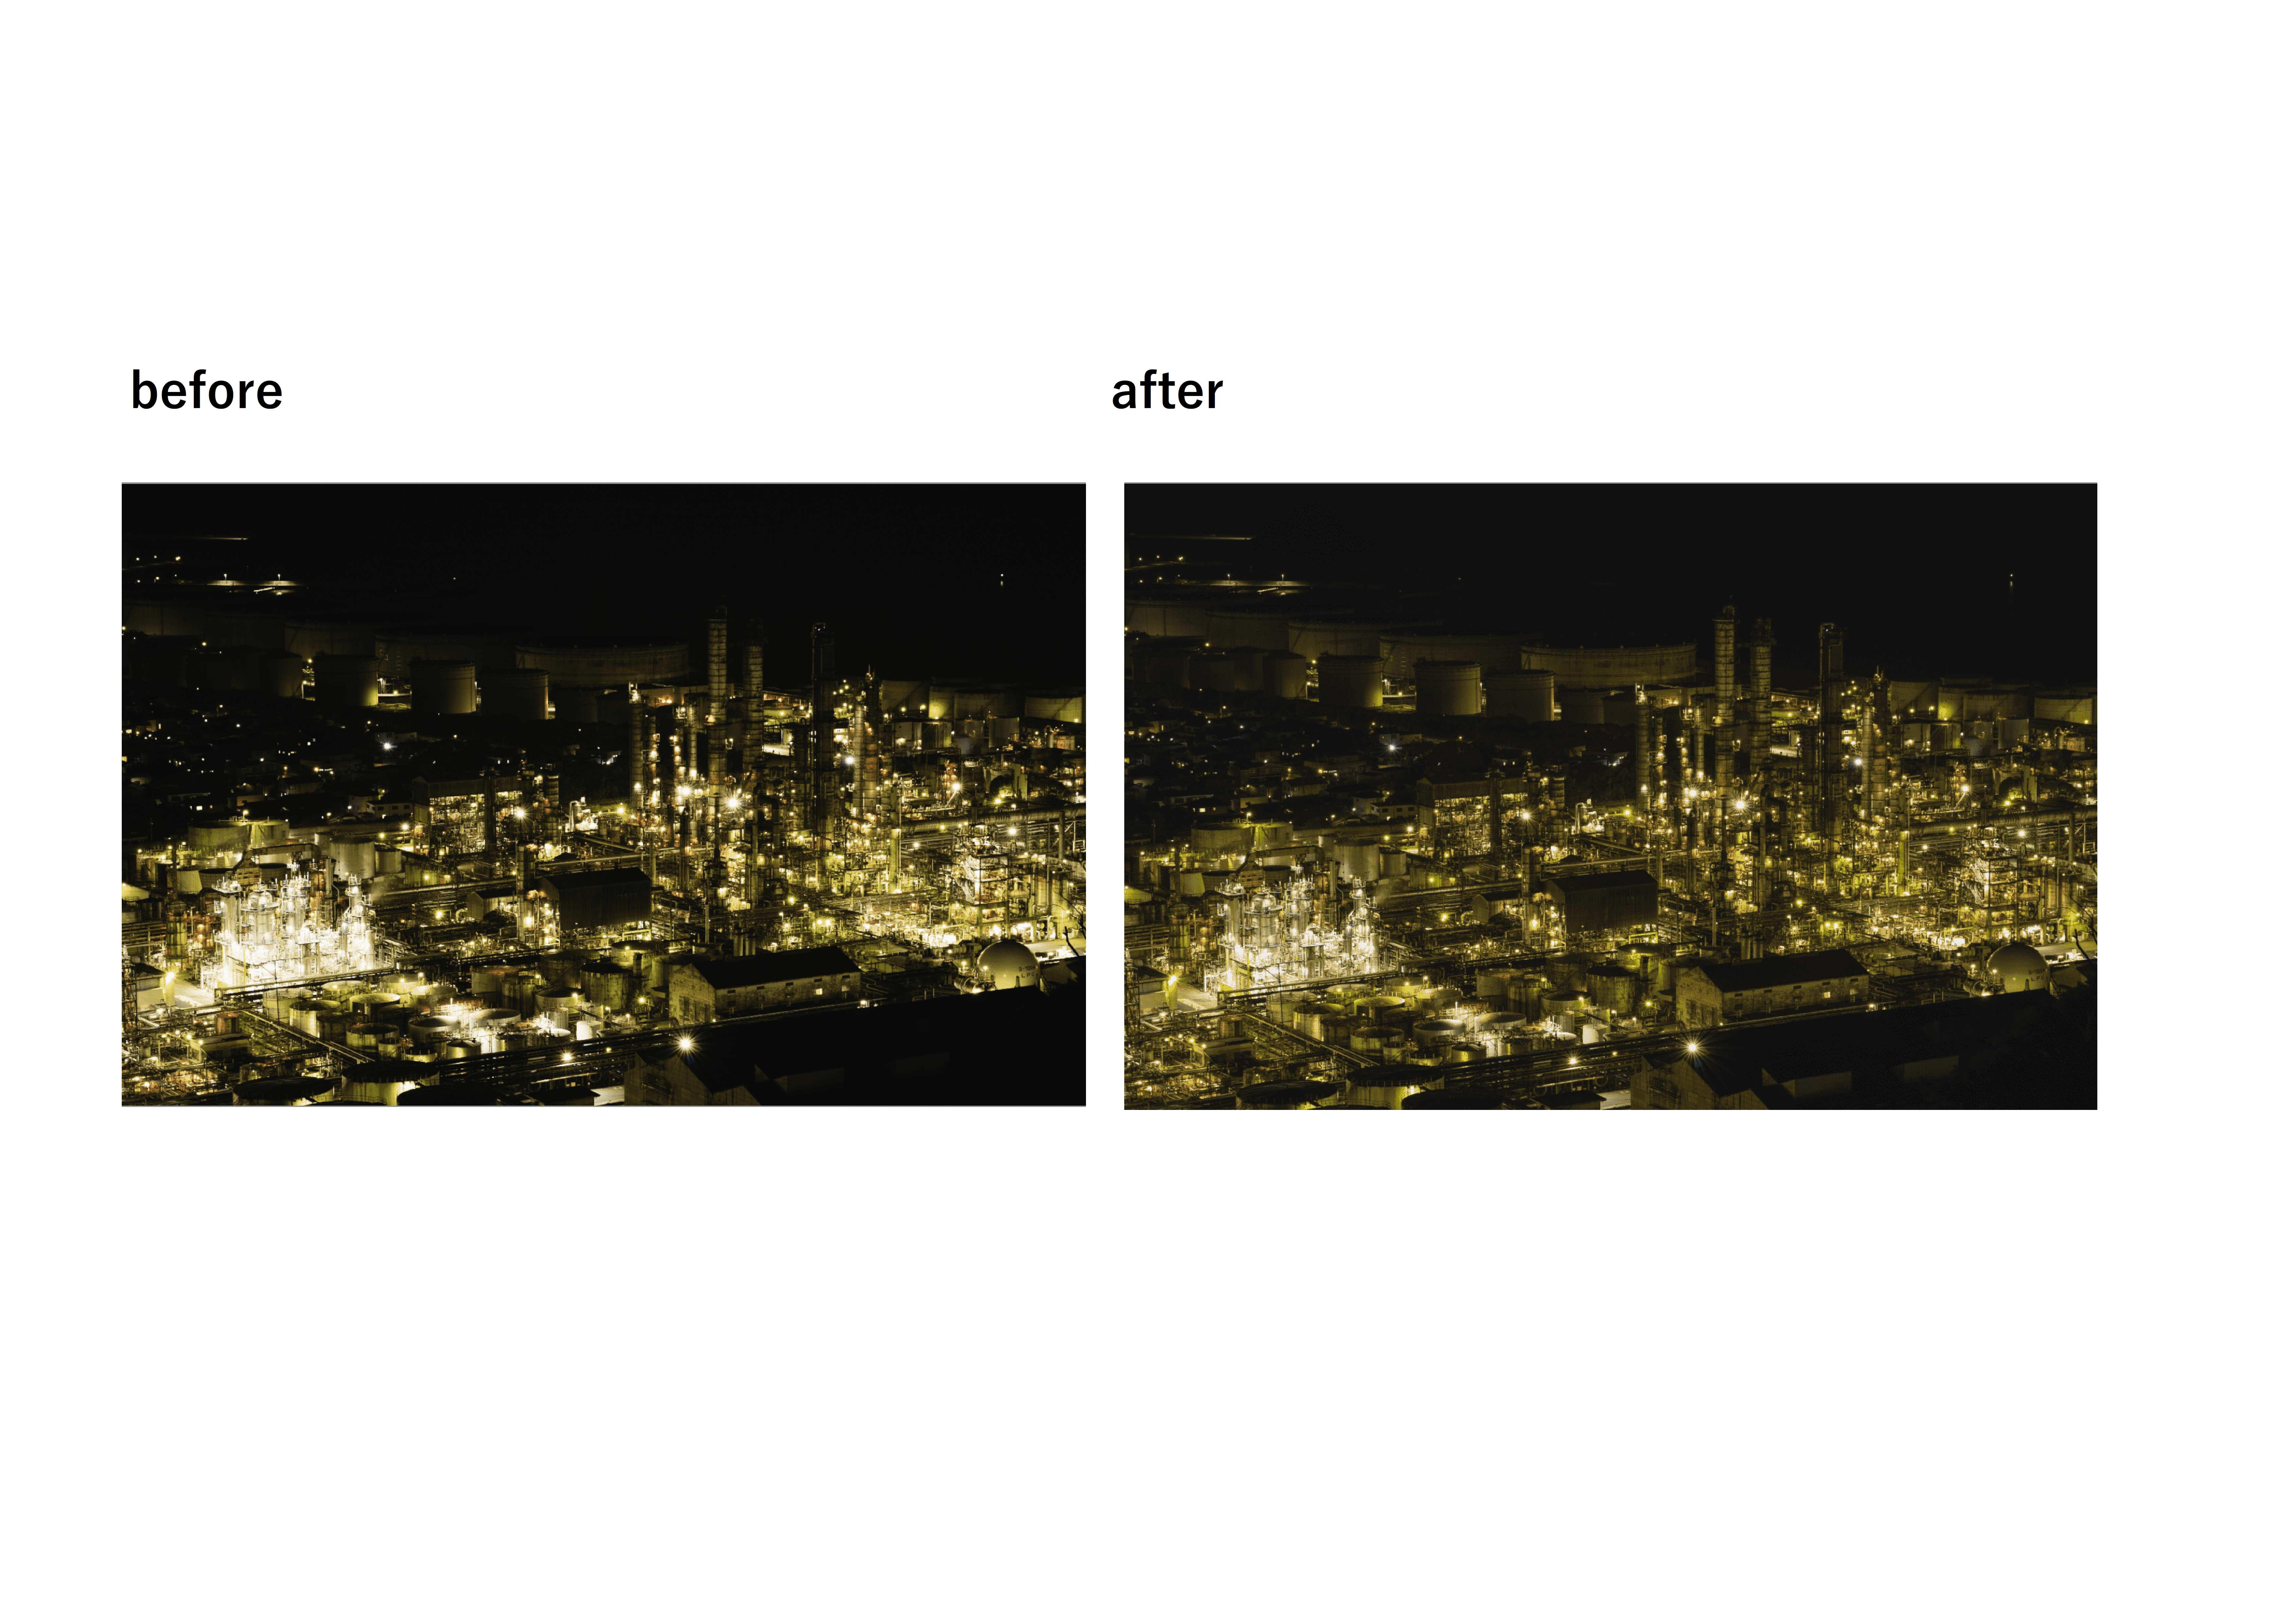 【lightroom】工場夜景レタッチ ハイライト・シャドービフォーアフター